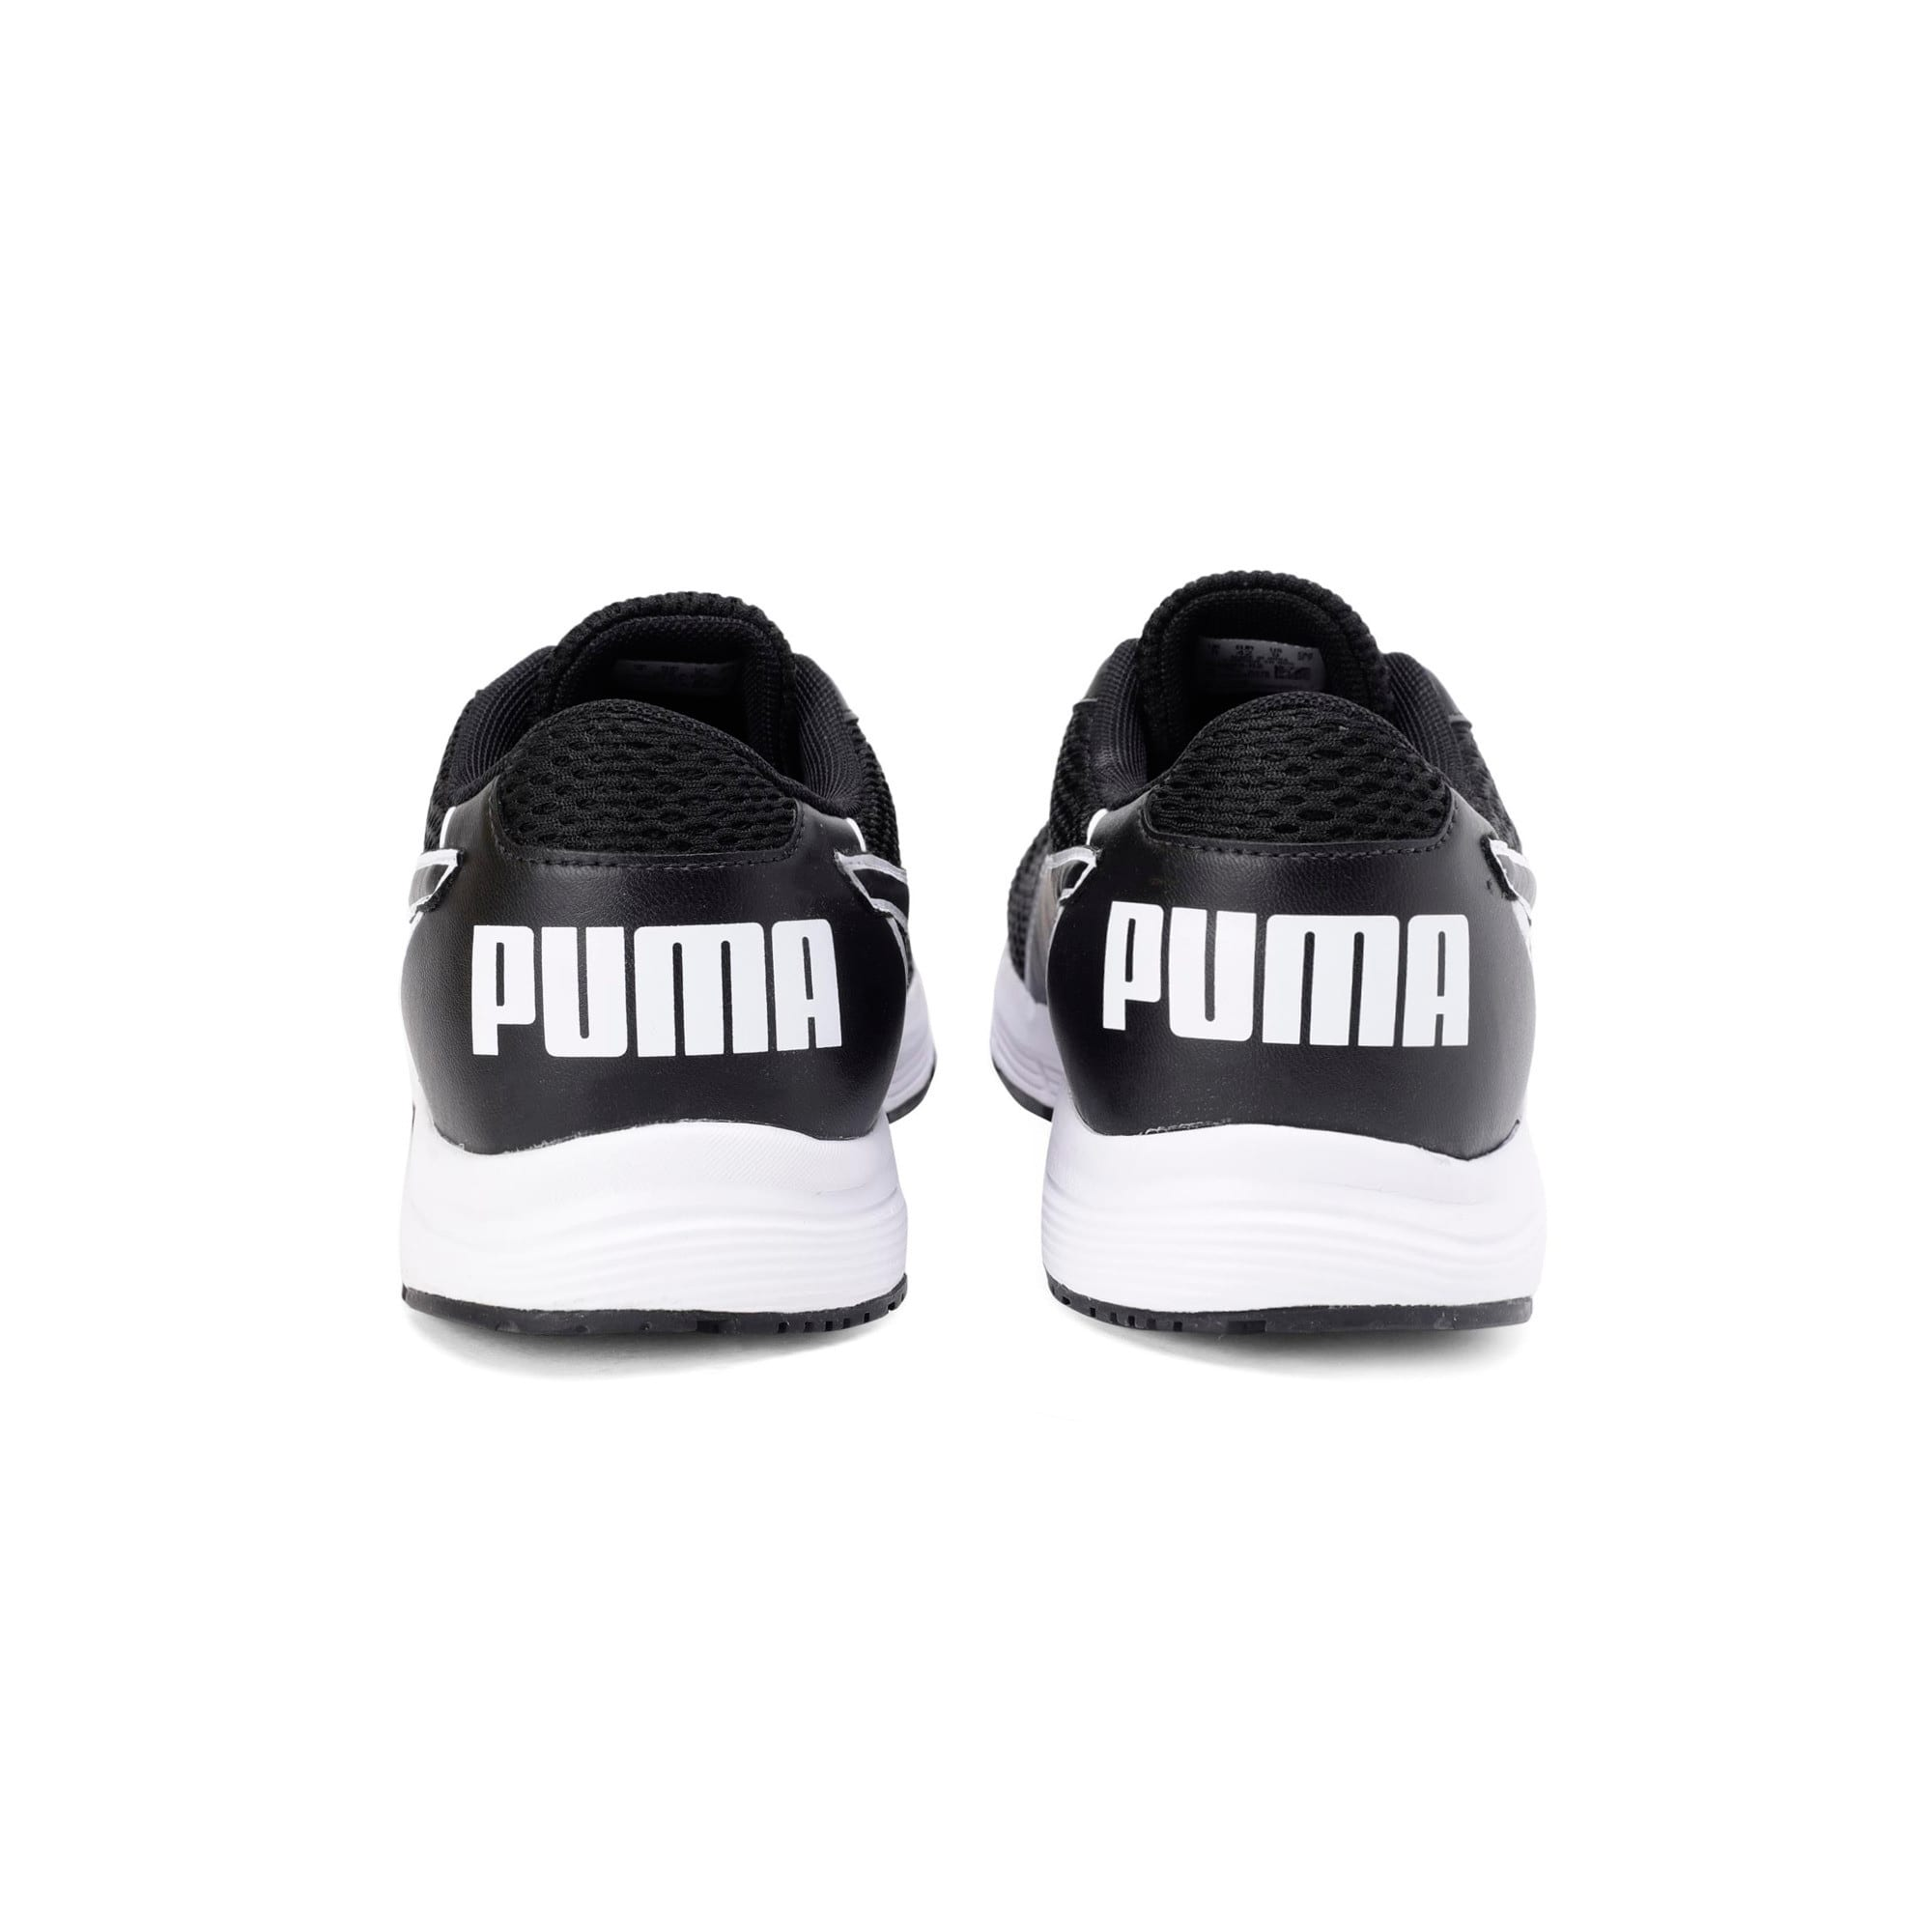 Thumbnail 3 of Metal Knit IDP, Puma Black-Puma White, medium-IND